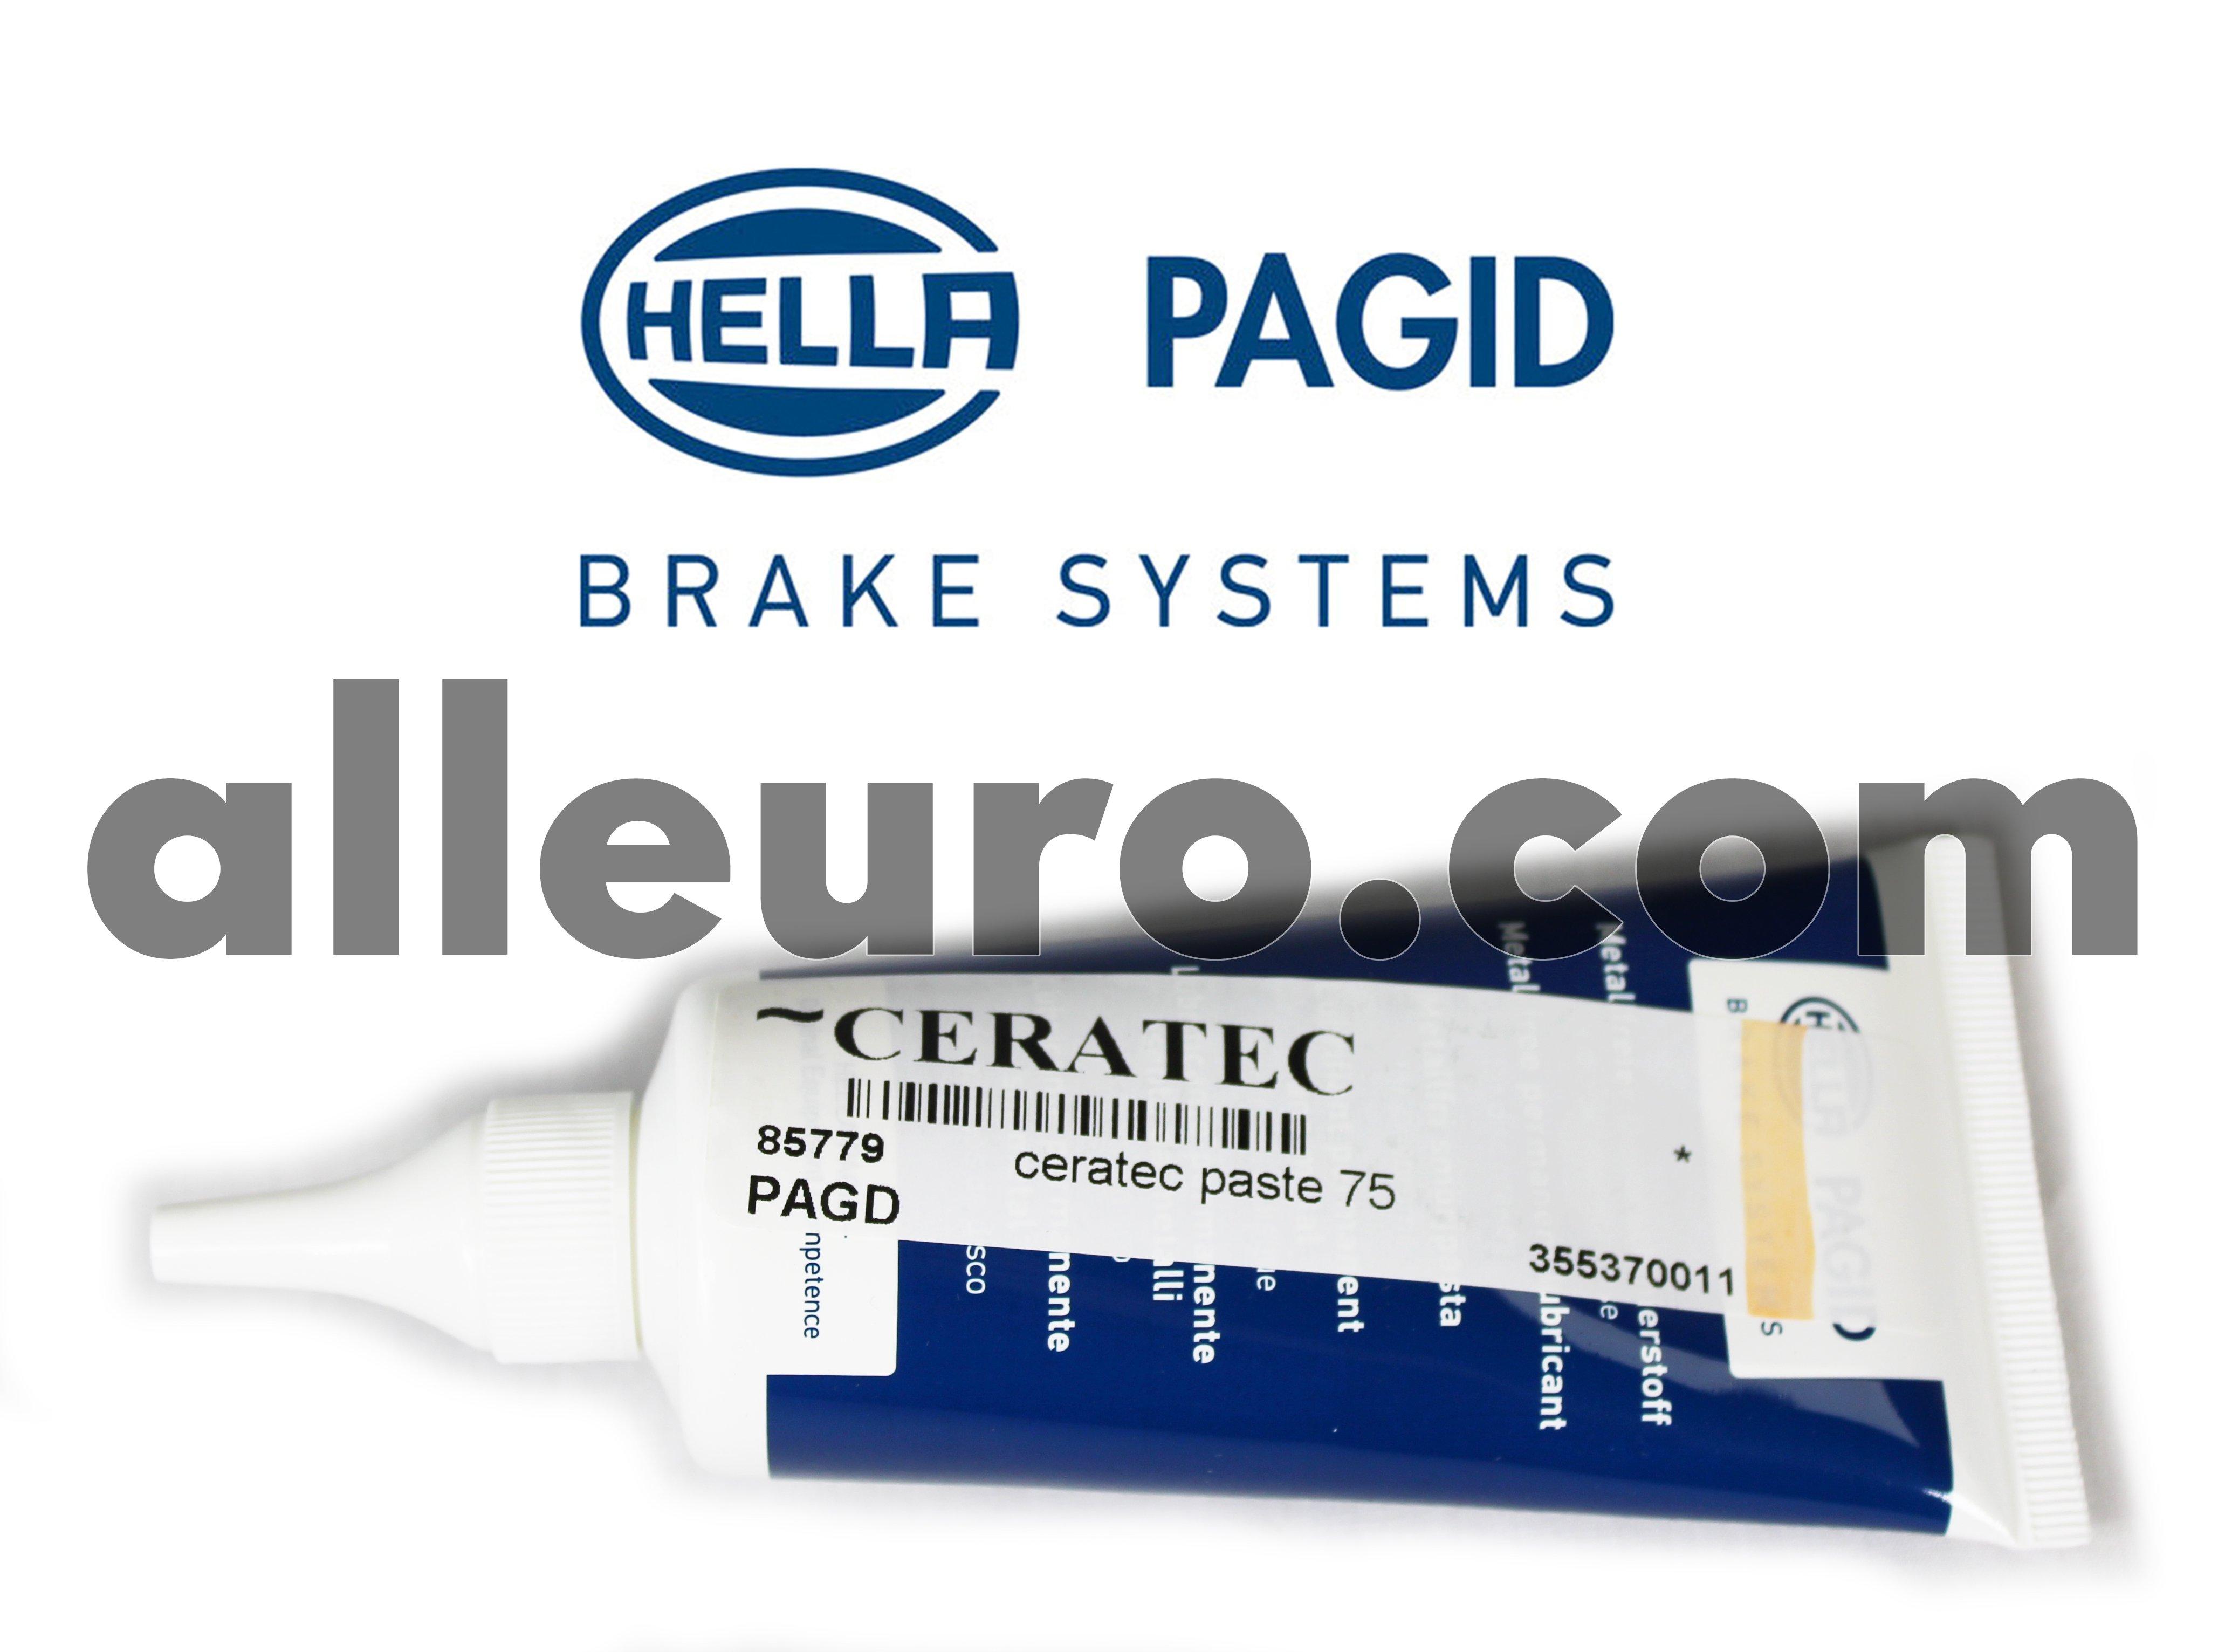 Hella Pagid Brake Lubricant Grease CERATEC - ceratec brake anti-squeal pad paste